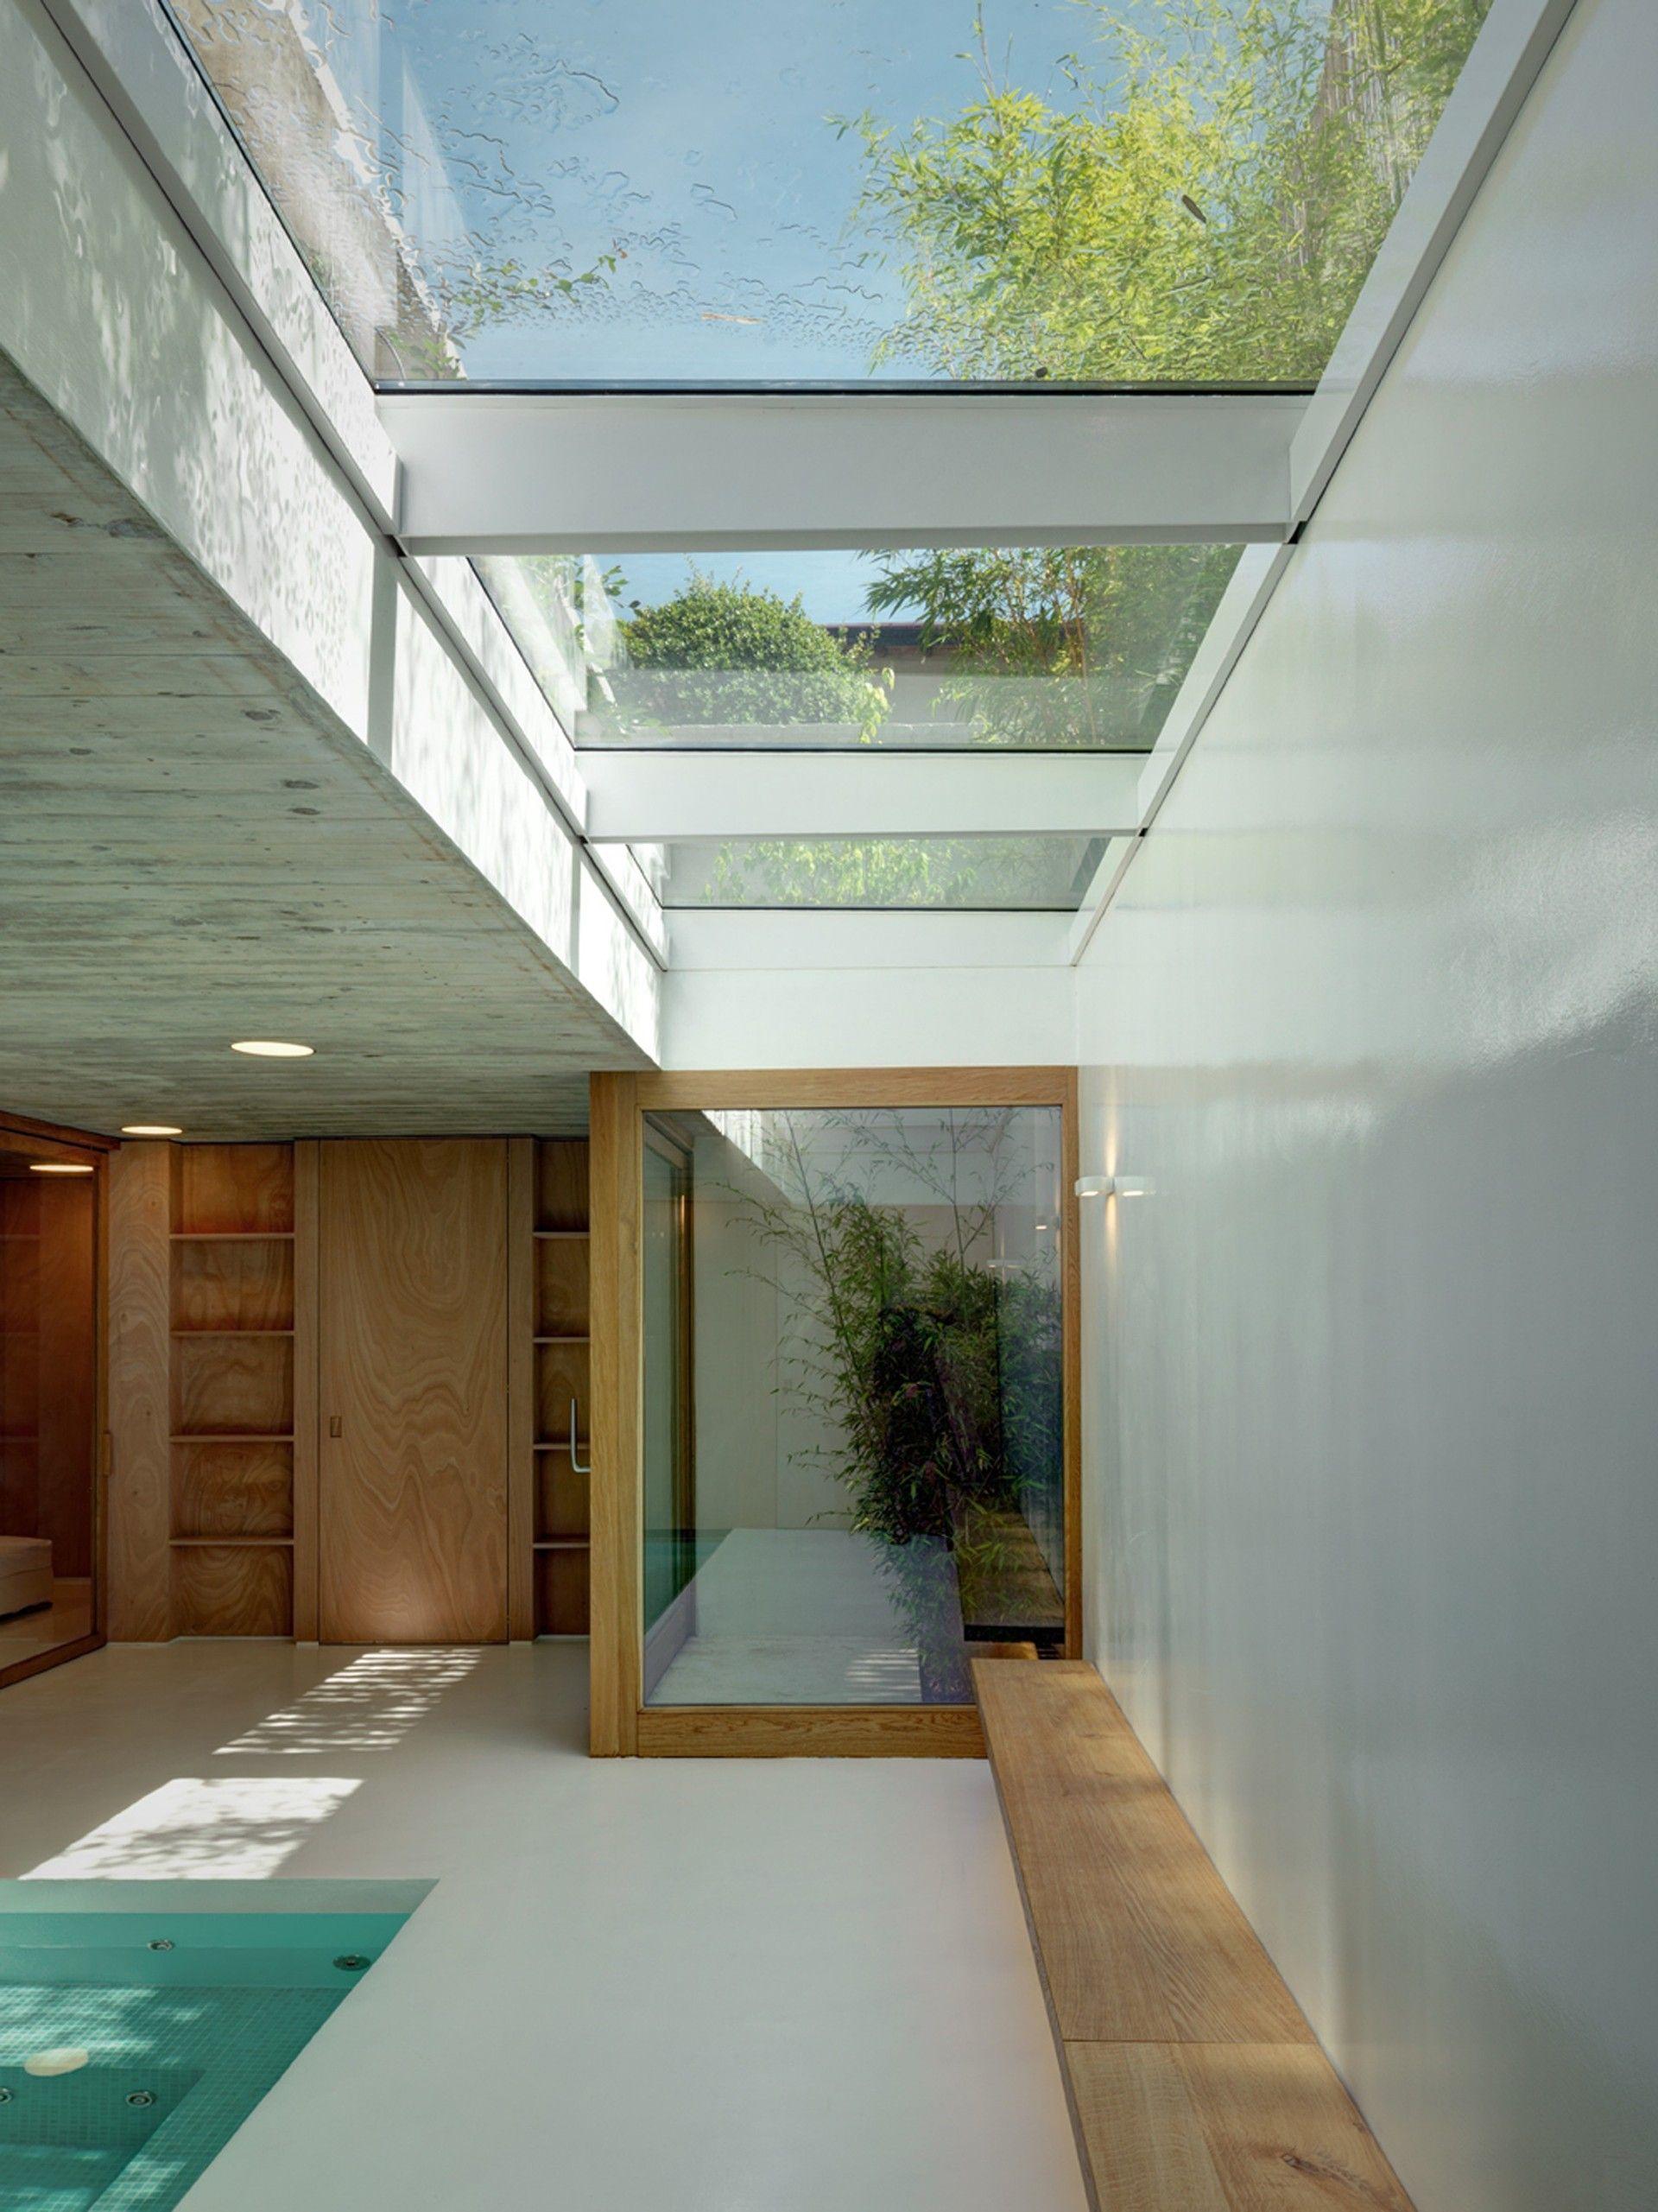 CASA RBS by Marco Ortallli | Architecture | Pinterest | Architektur ...